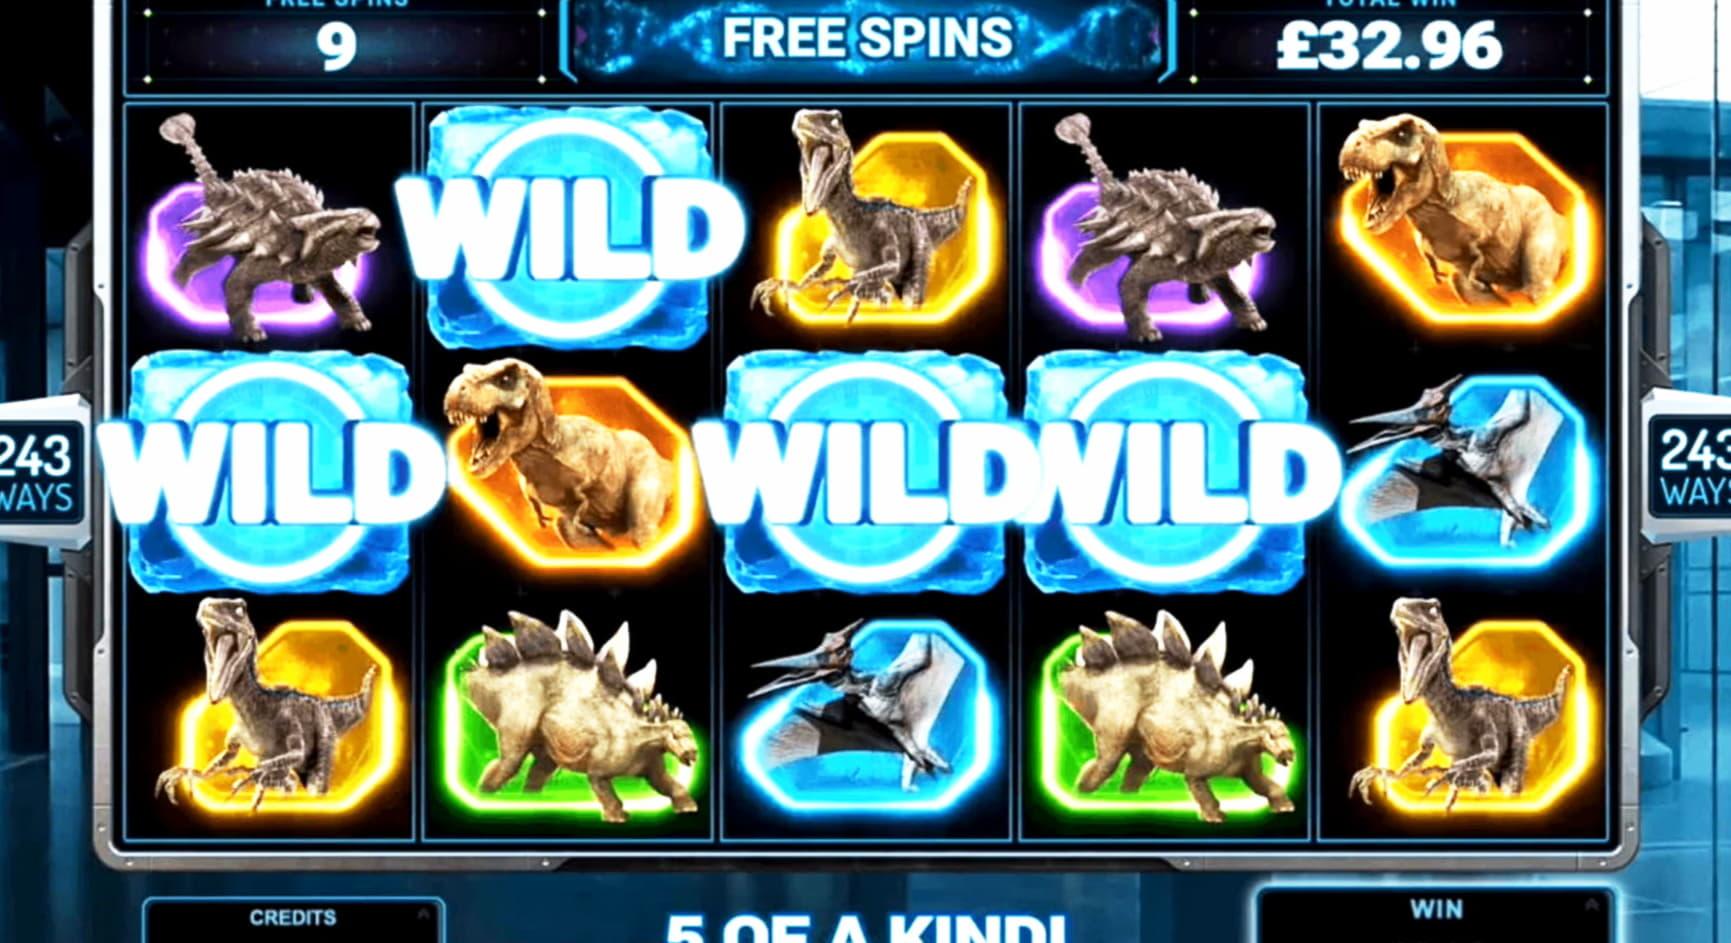 Eur 4920 No Deposit at All Slots Casino